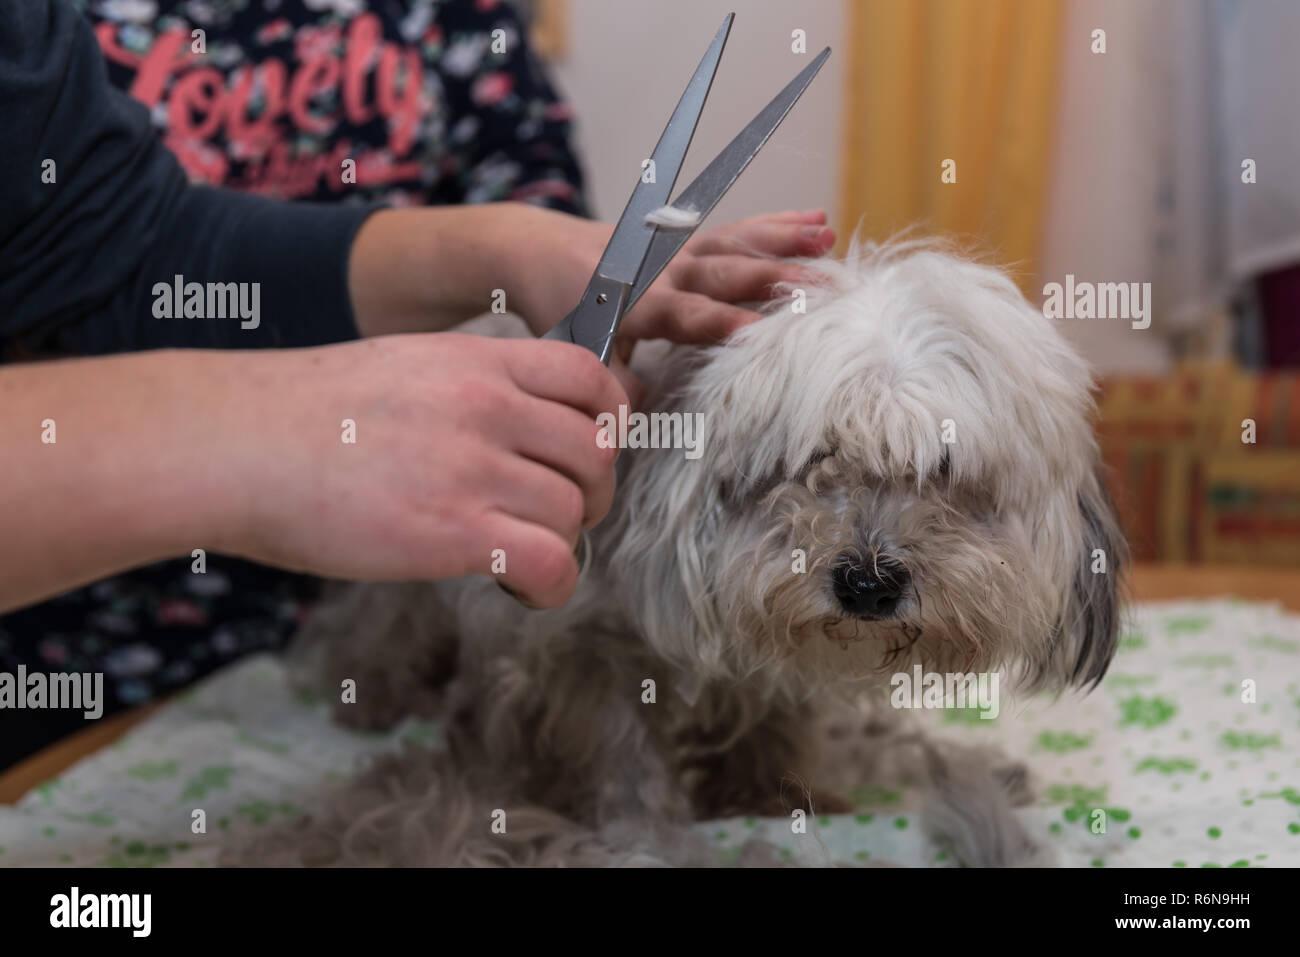 kleiner Hund beim Hundefriseur - Stock Image